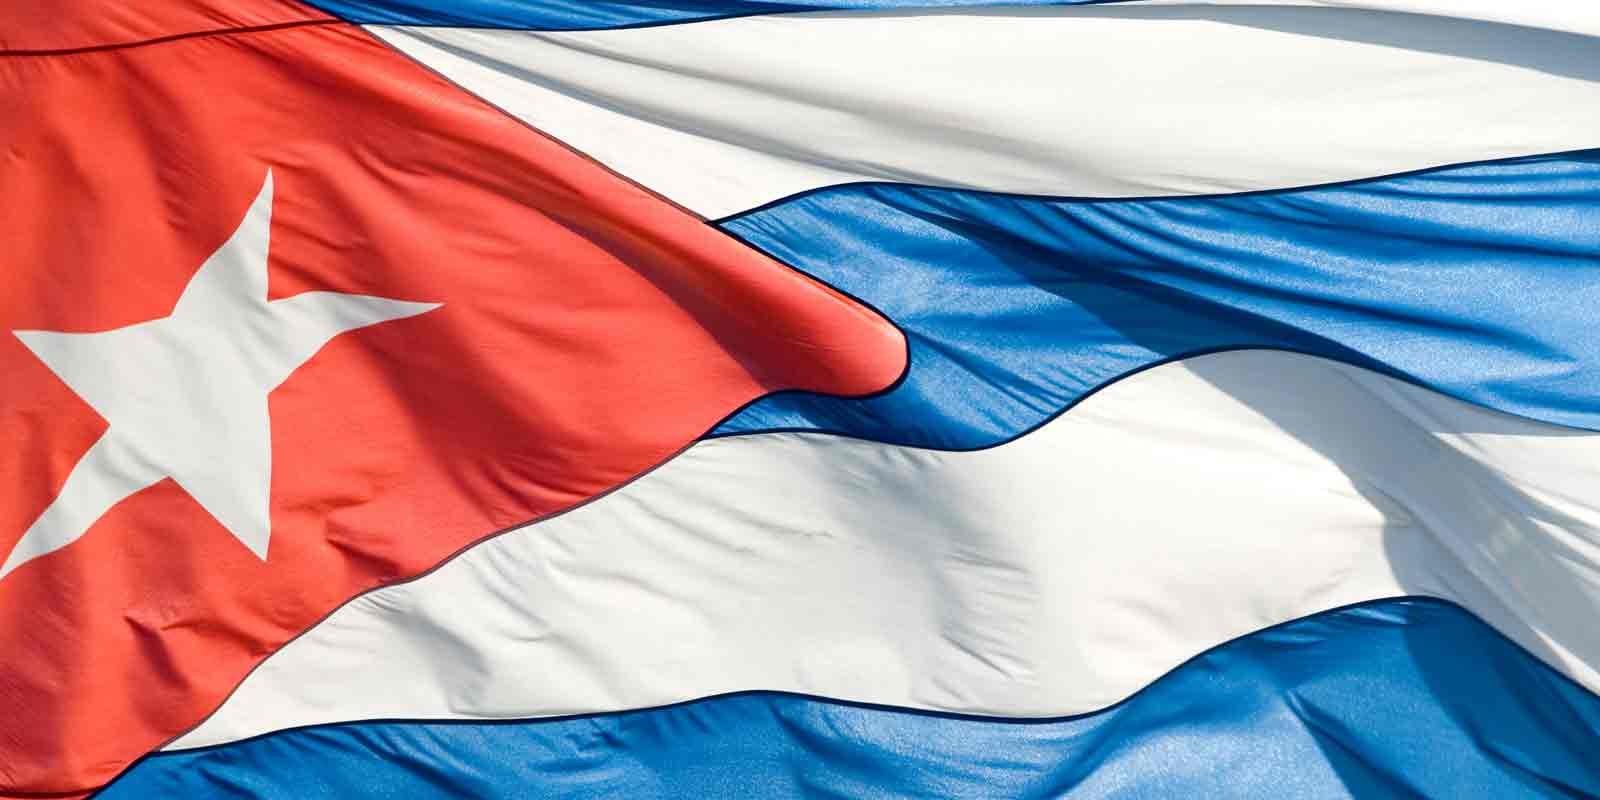 Cuban flag waving in the wind.